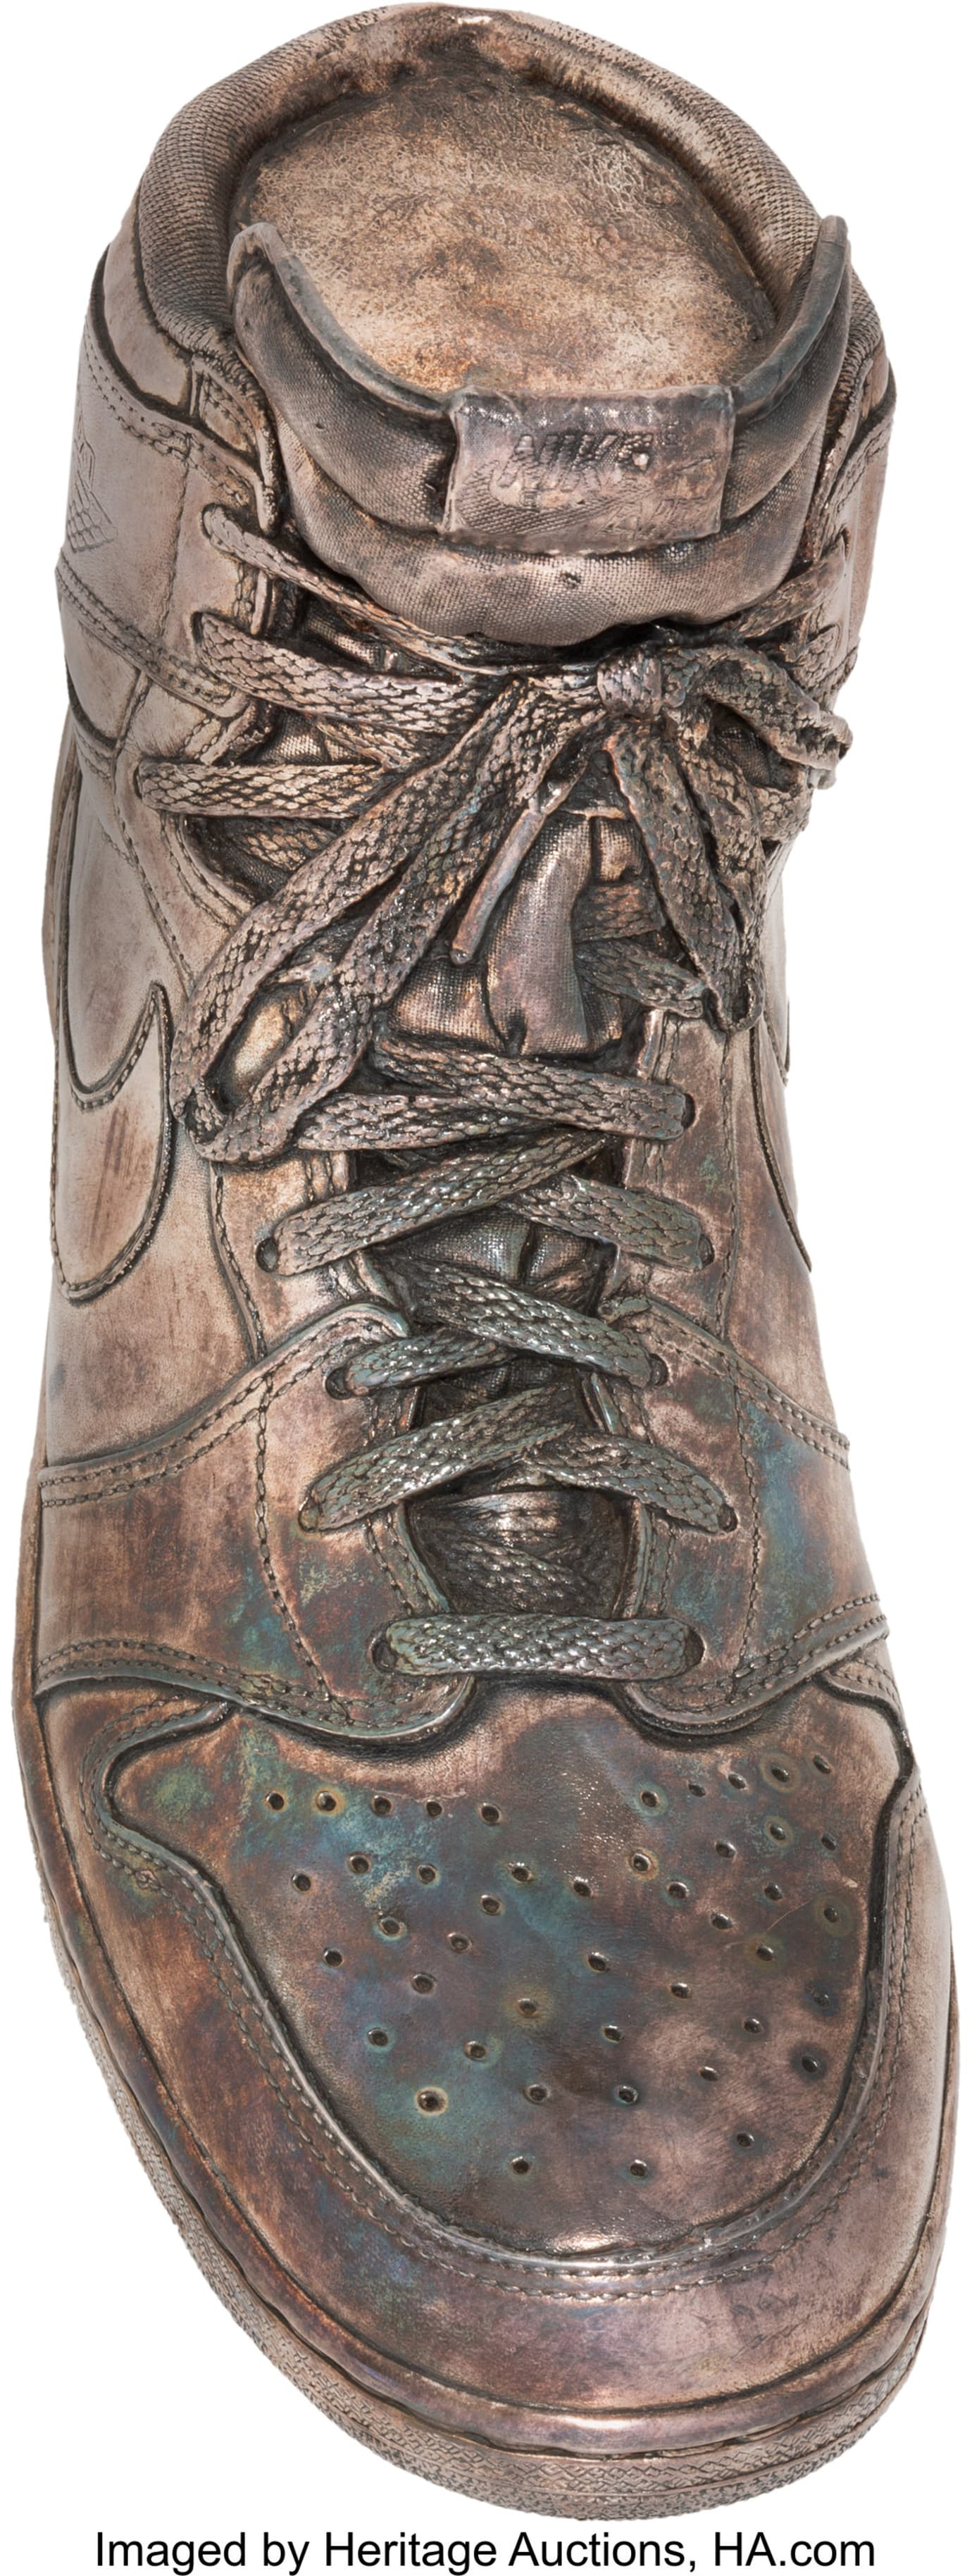 Image via Heritage Auctions air-jordan-1-silver-auction 833126f29